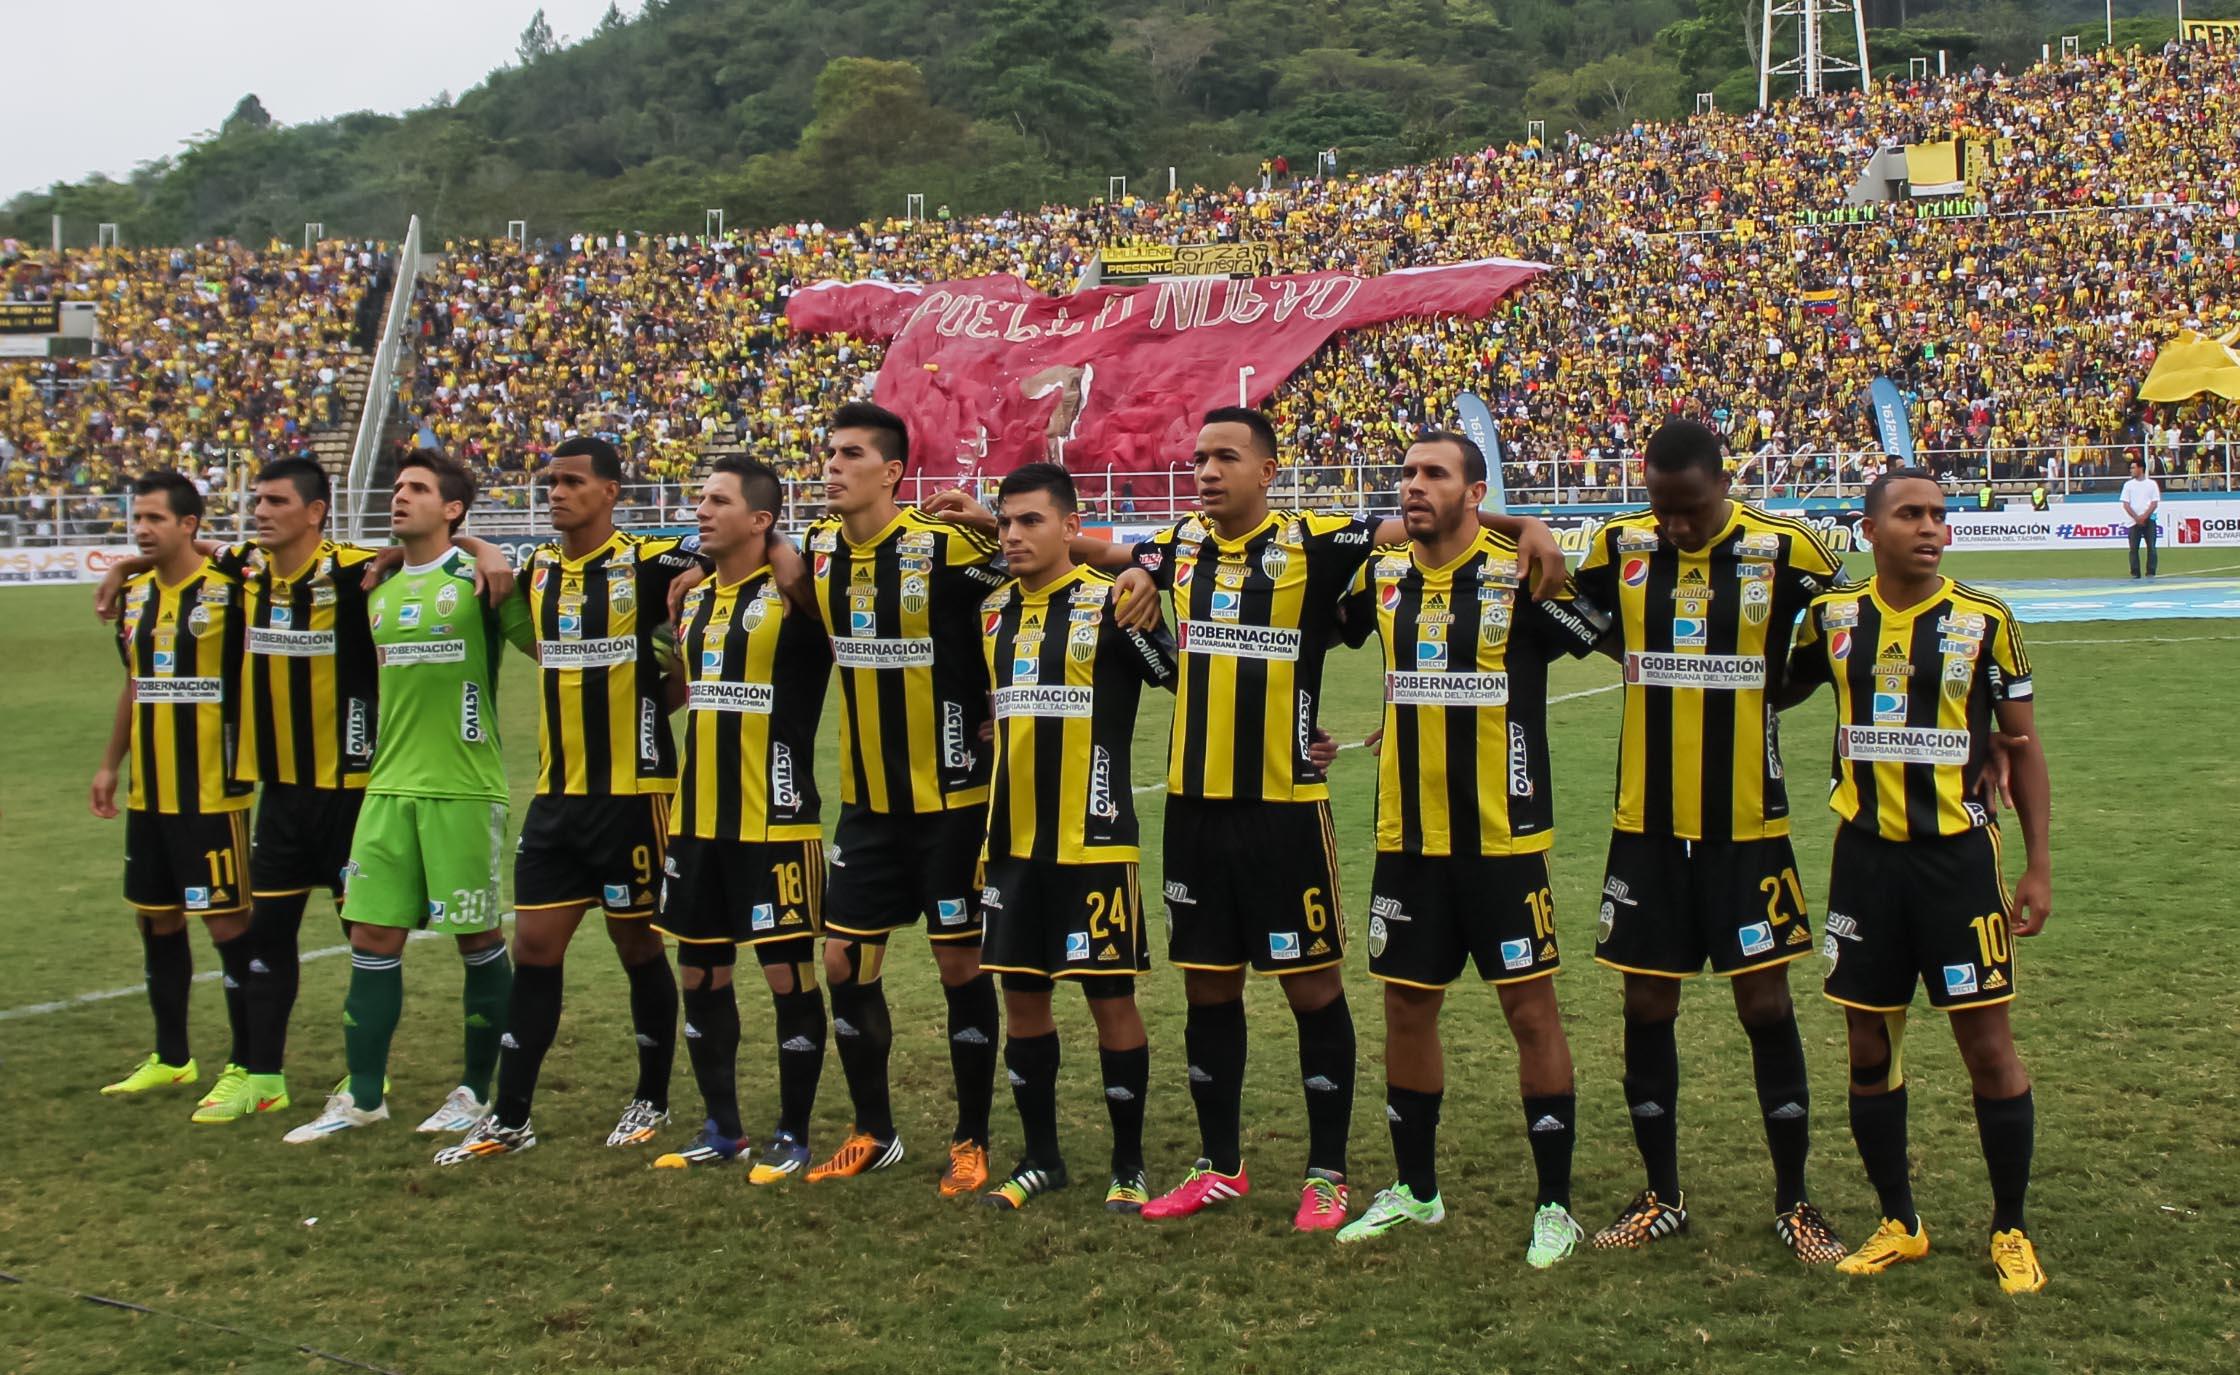 Primera Division Venezuela mercoledì 17 ottobre